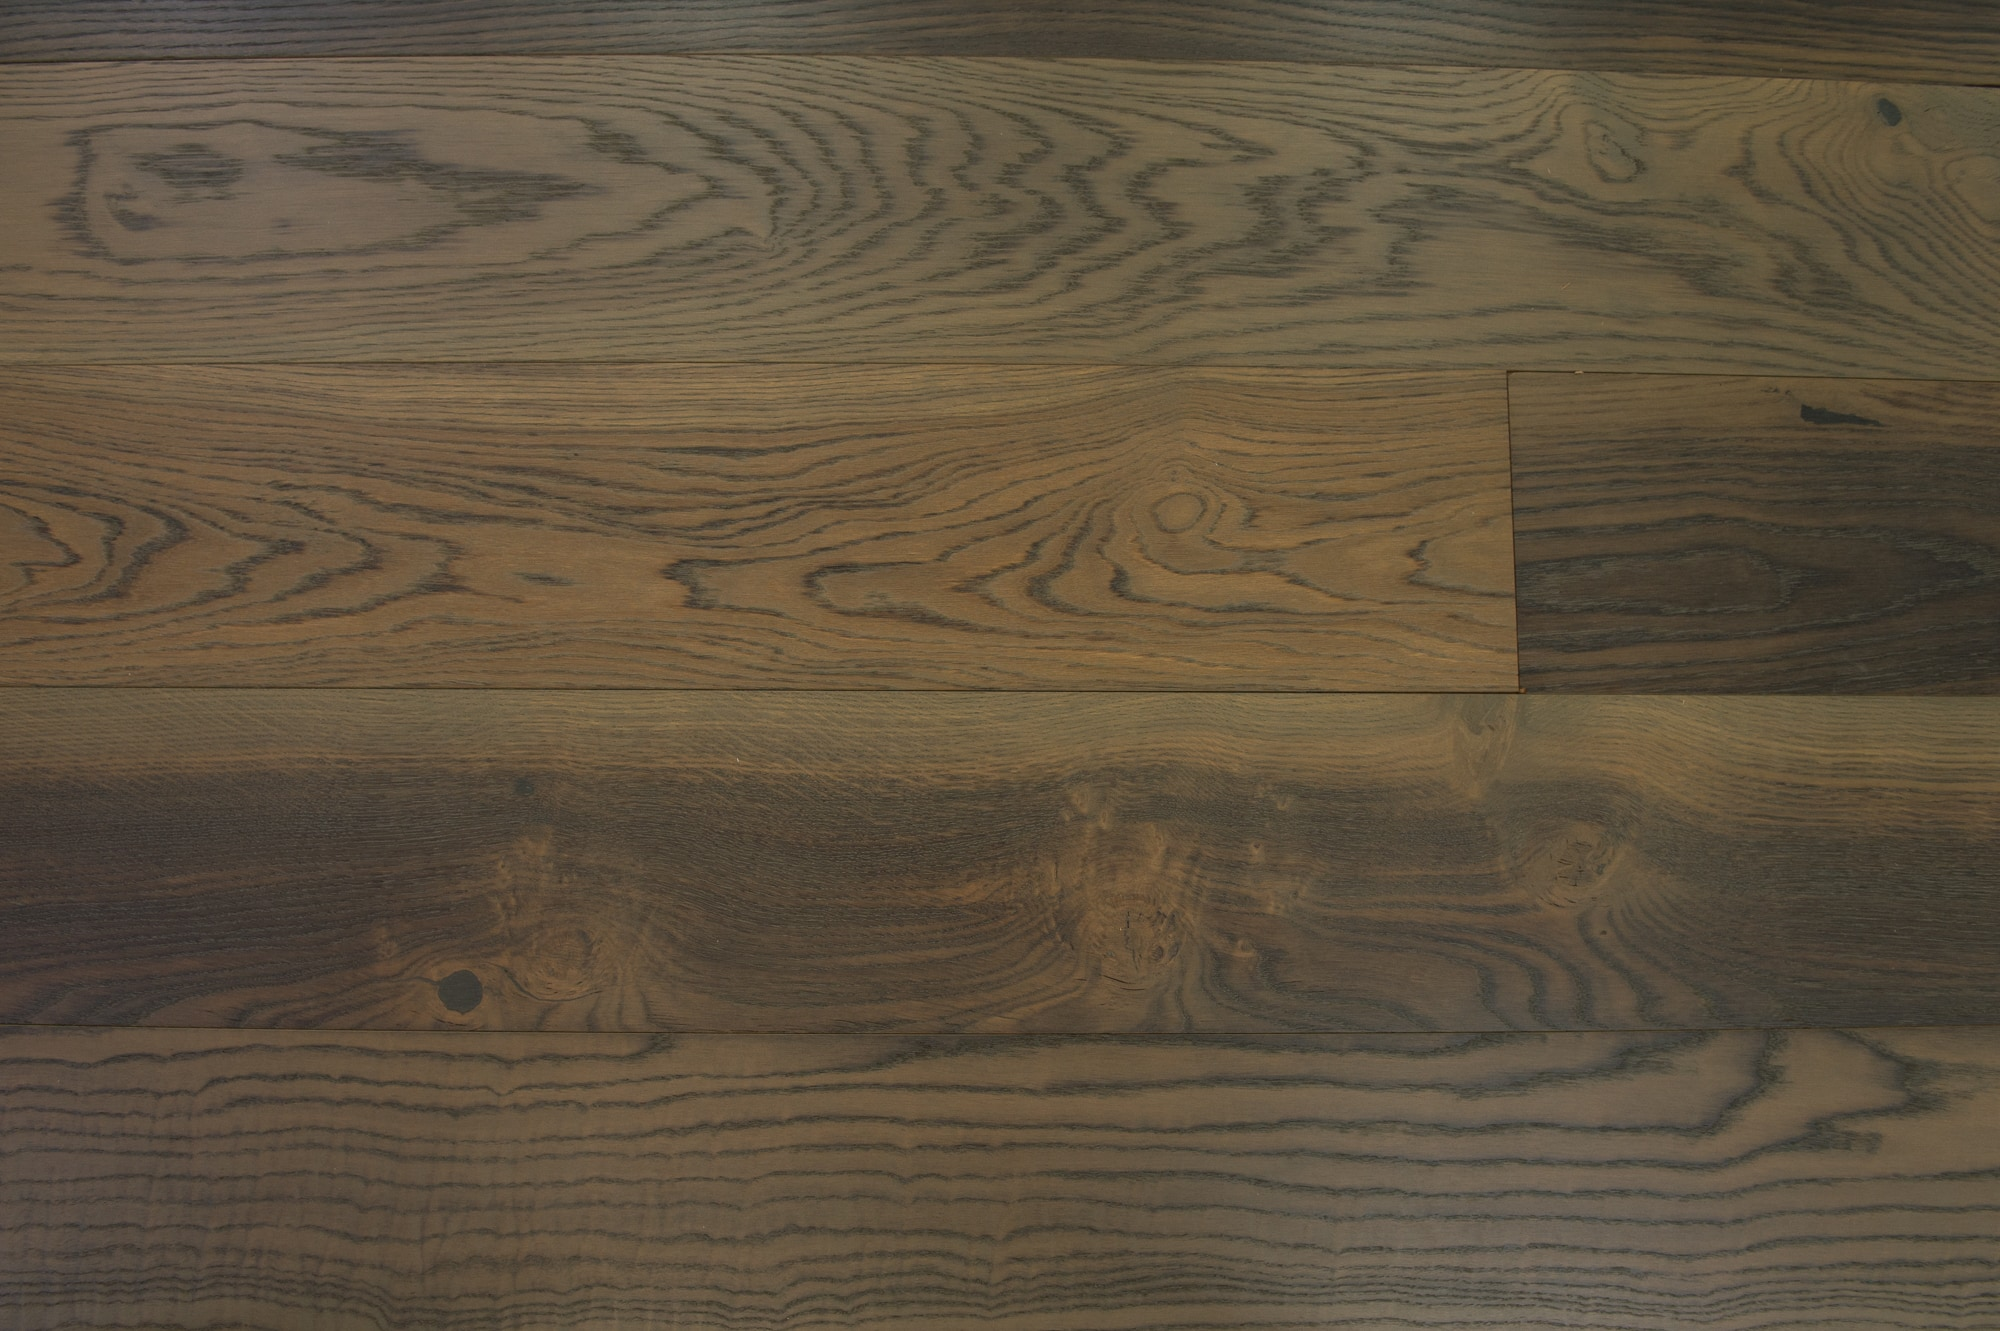 "Caraway / European White Oak / UV Oil Finish / ABCD / 1/2"" x 7-1/2"" Engineered Hardwood - European White Oak - Denali Collection 0"